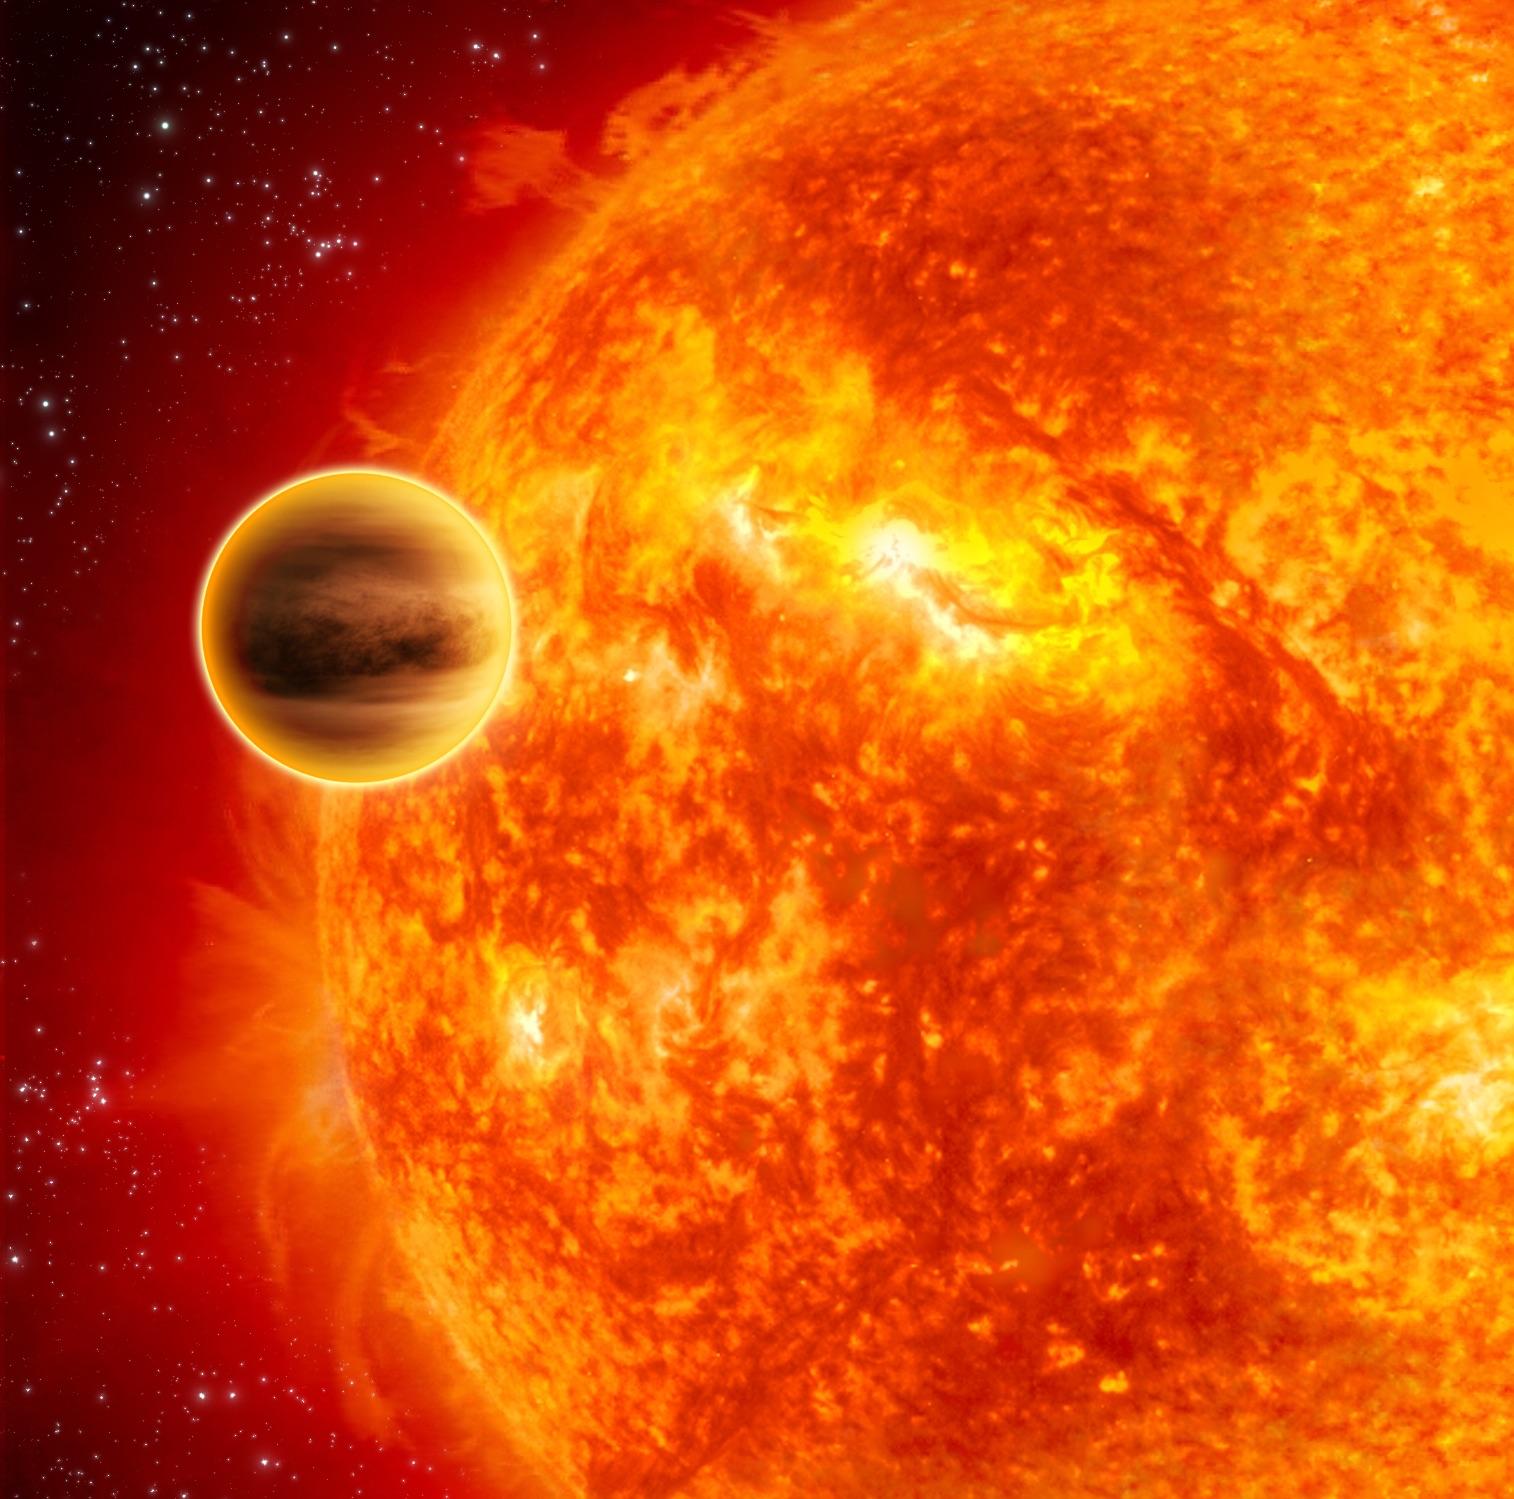 Transiting_exoplanet_HD_189733b